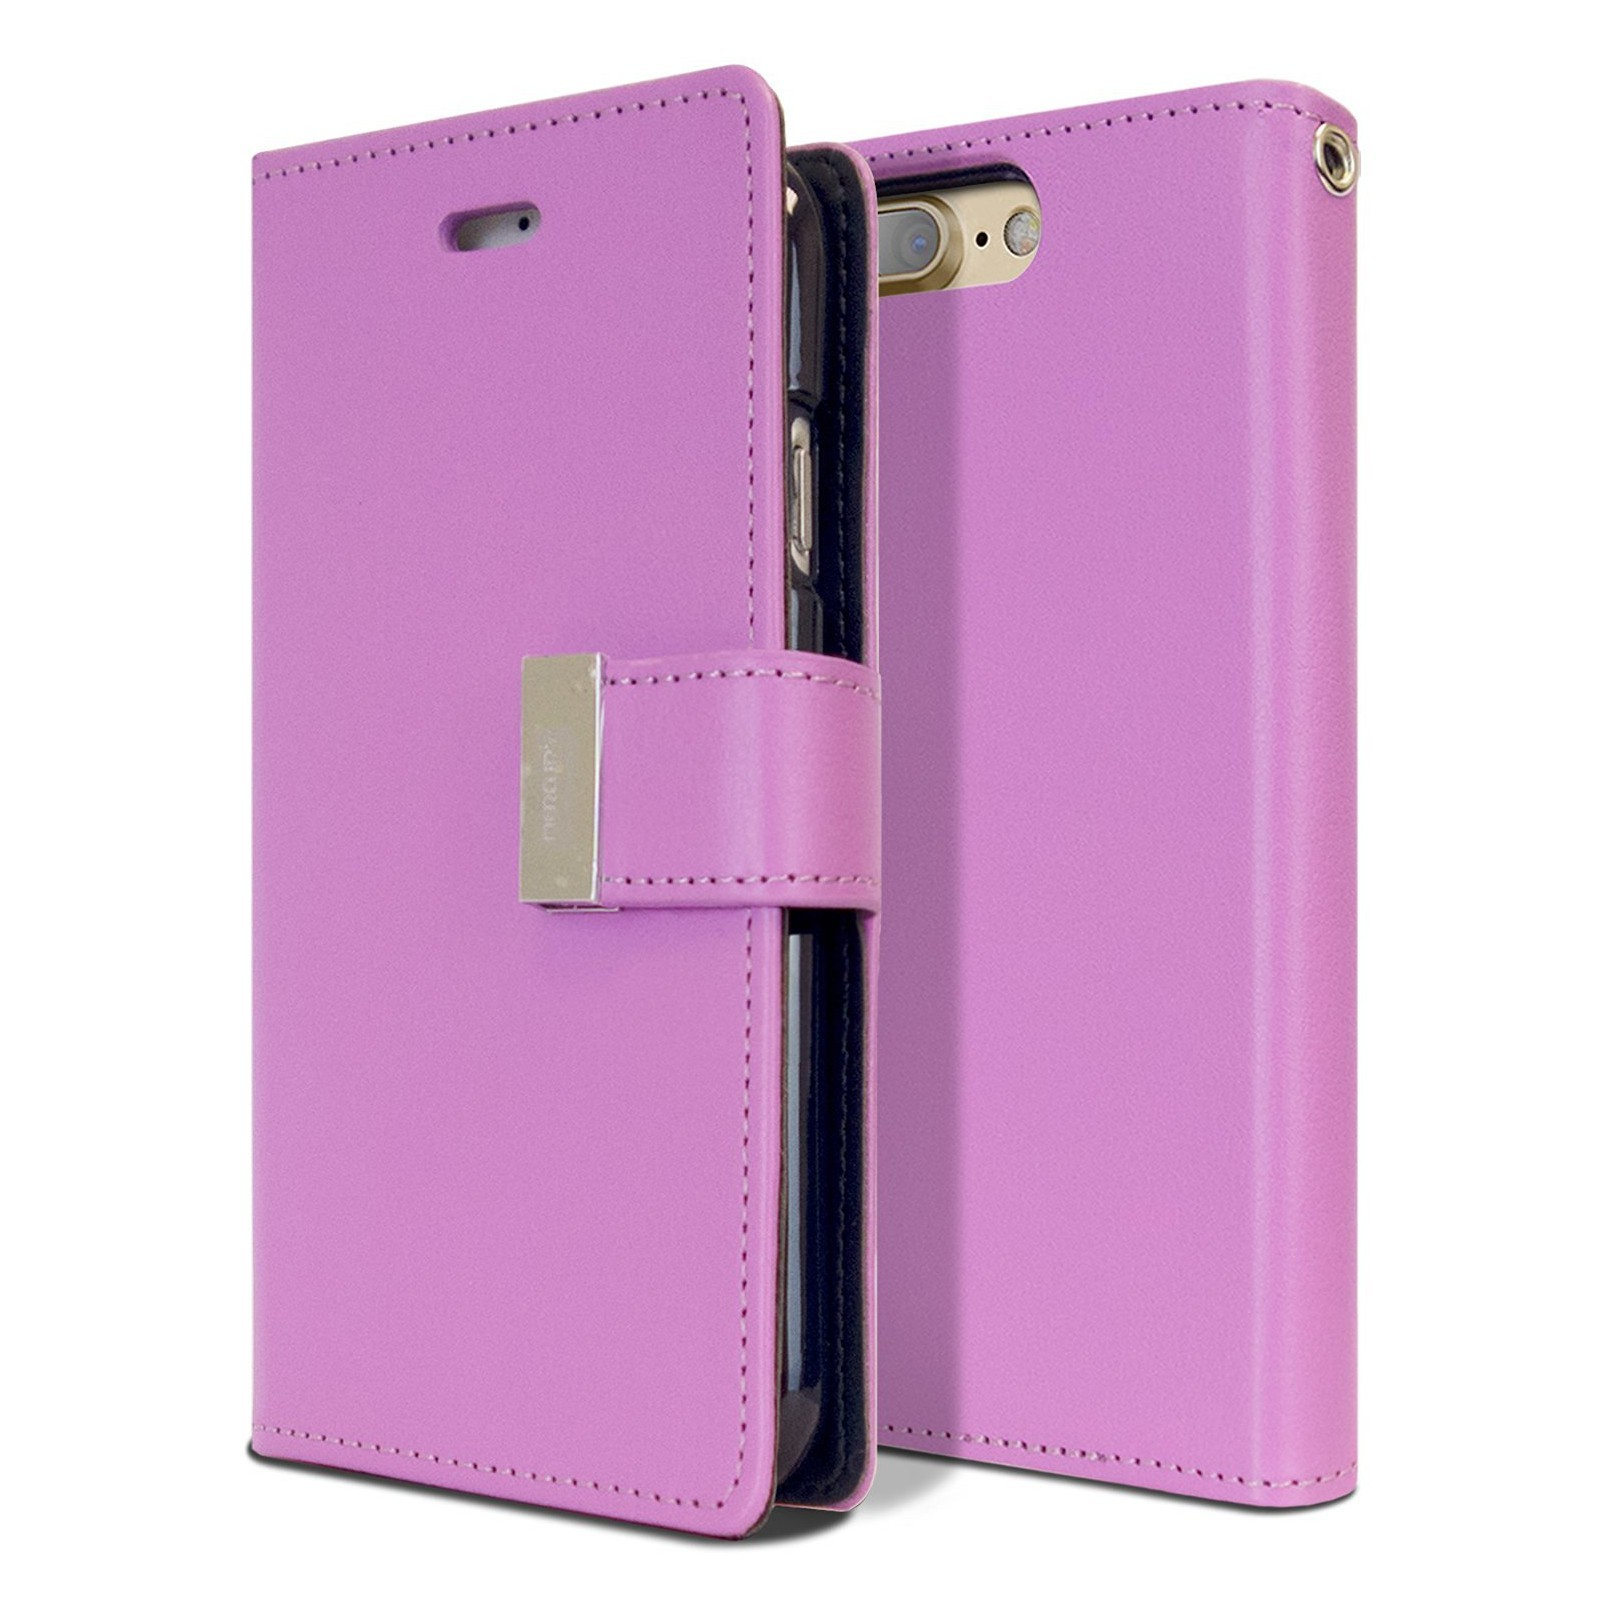 Elegantní pouzdro Goospery Rich Diary pro iPhone 8 Plus / iPhone 7 Plus - fialový